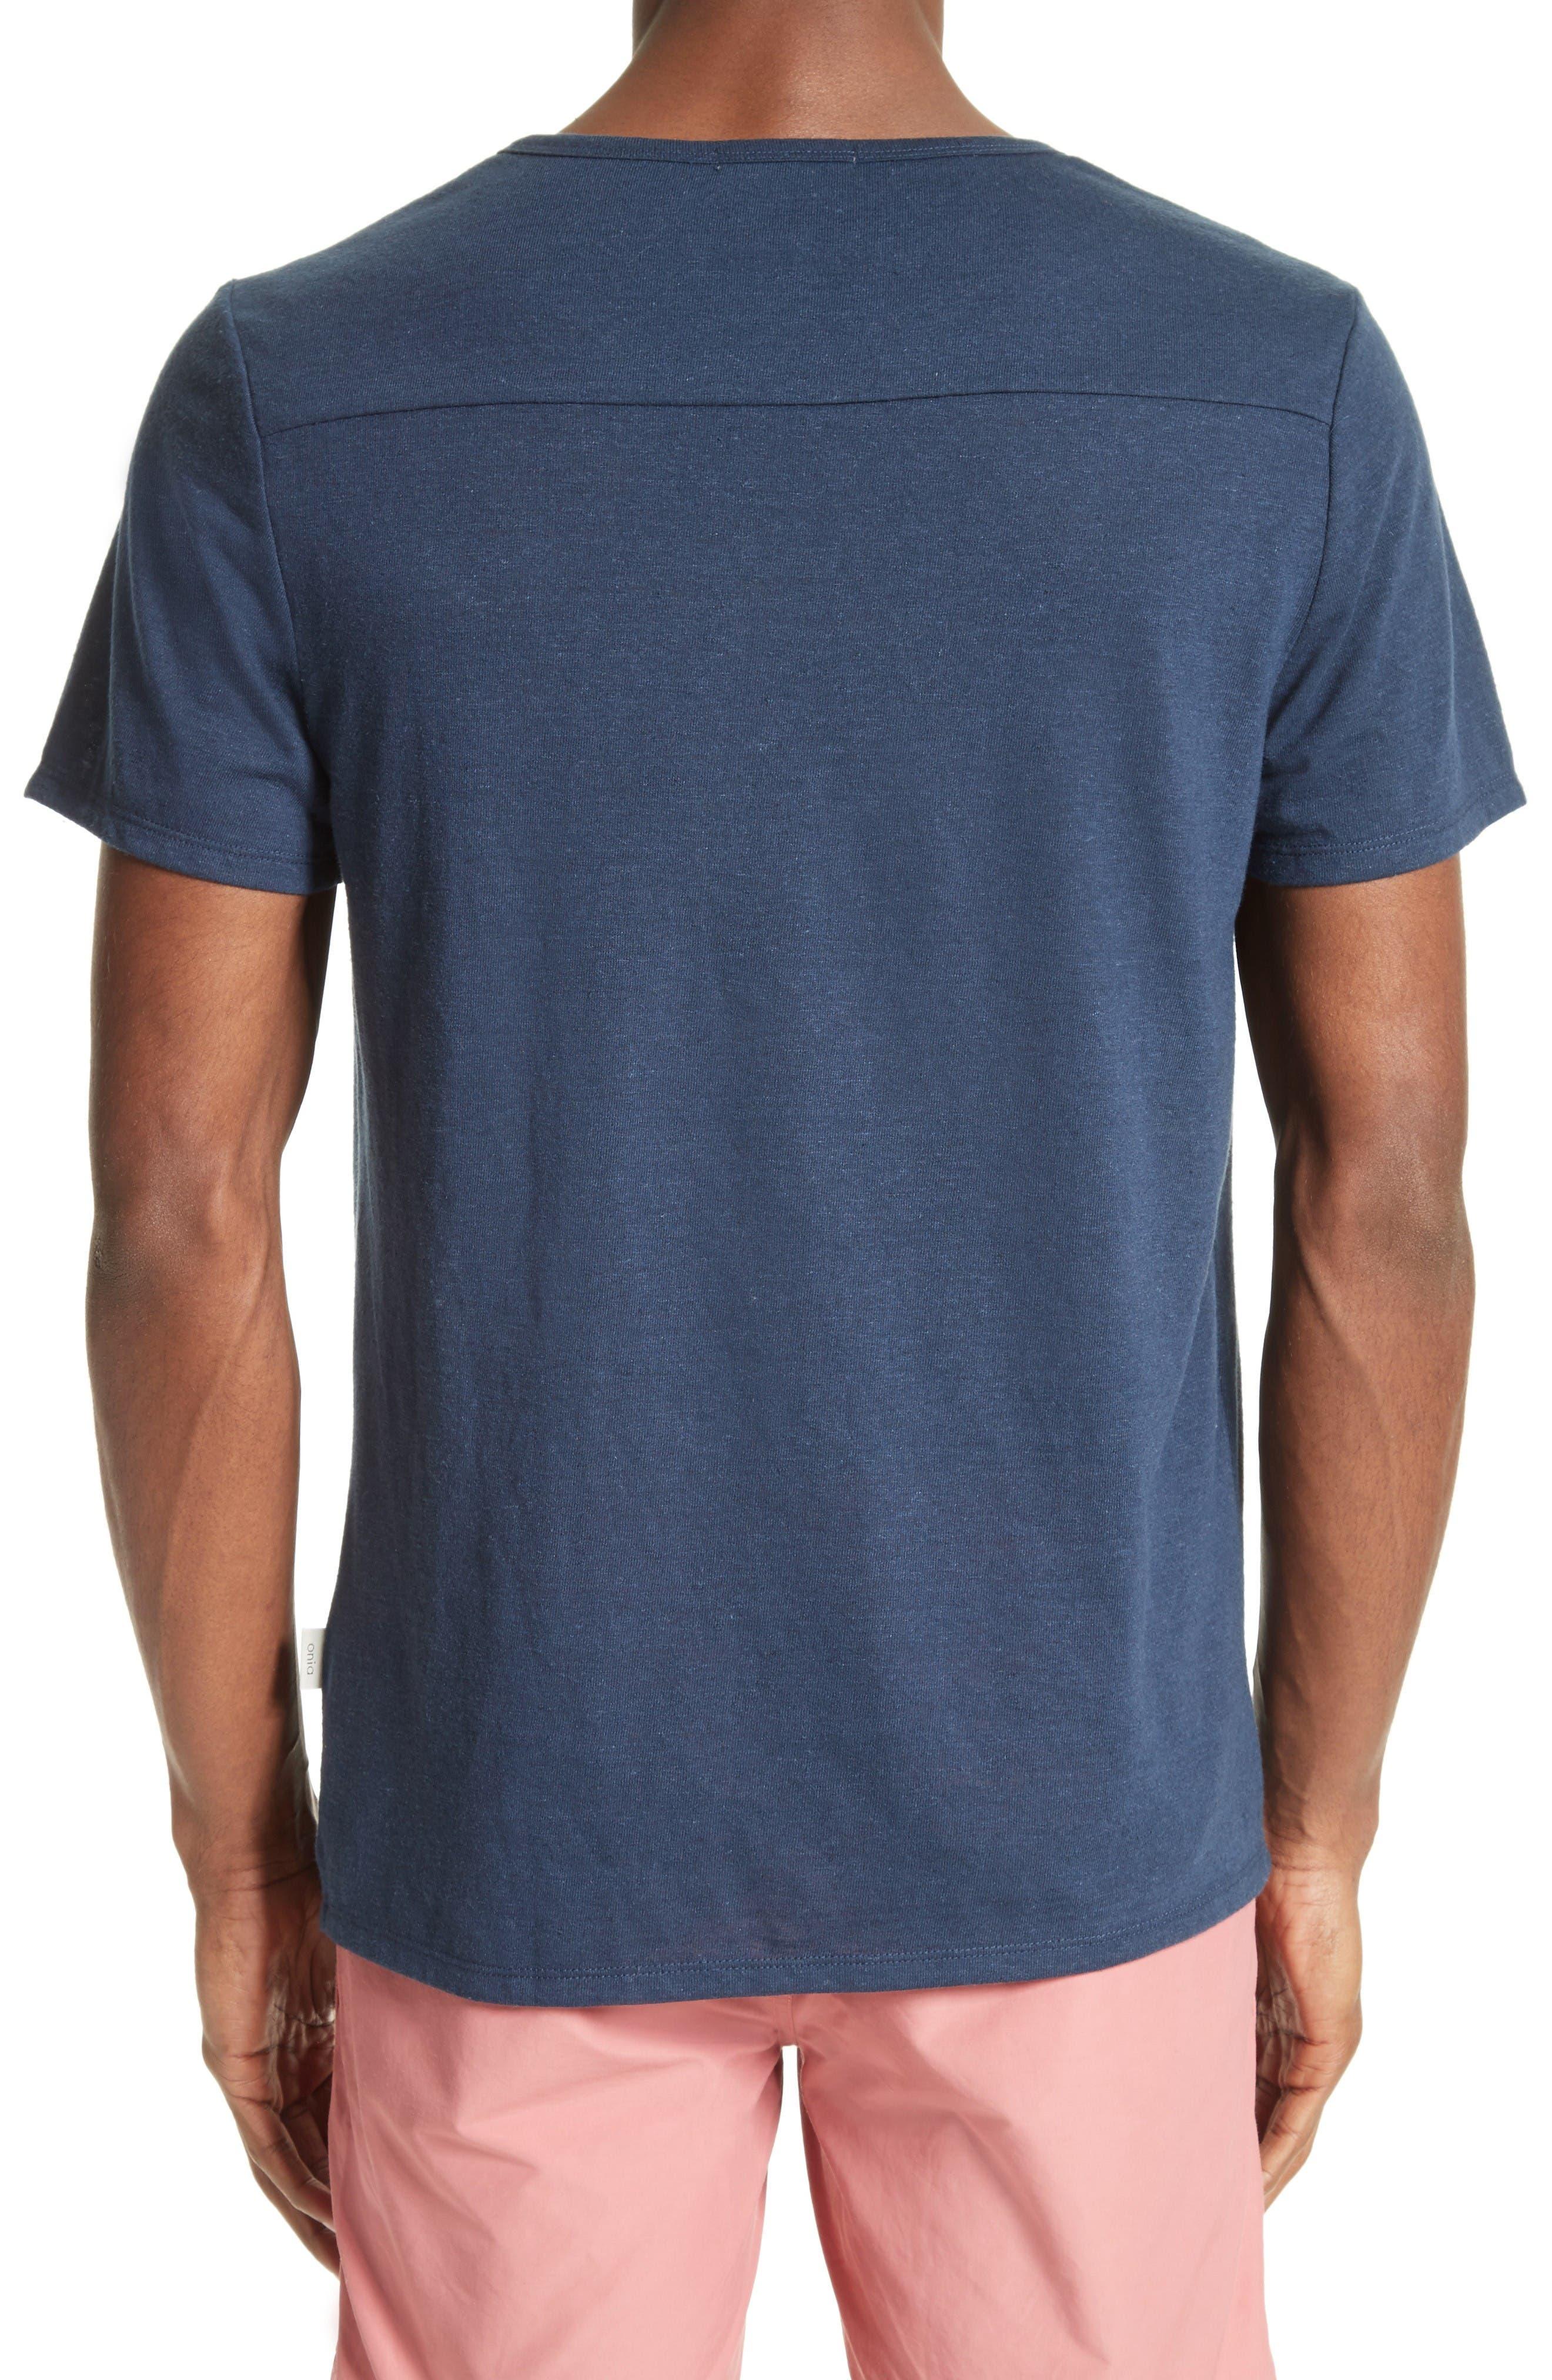 Alternate Image 2  - ONIA Chad Linen Blend Pocket T-Shirt